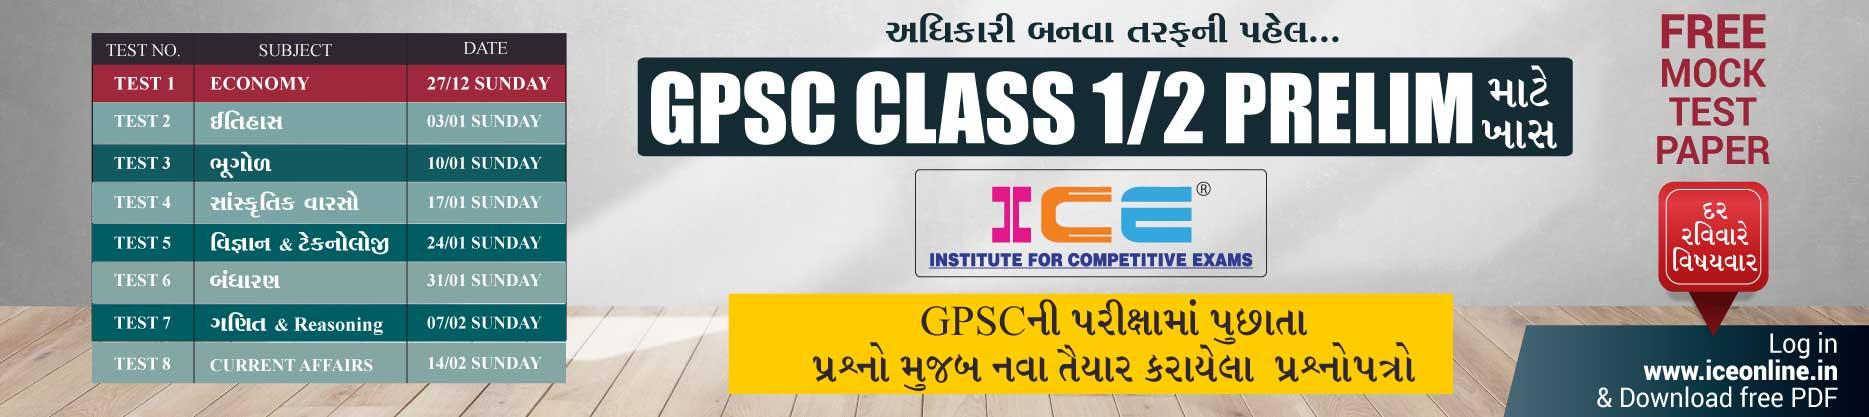 GPSC Class 1/2 Prelim Exam Mock Test